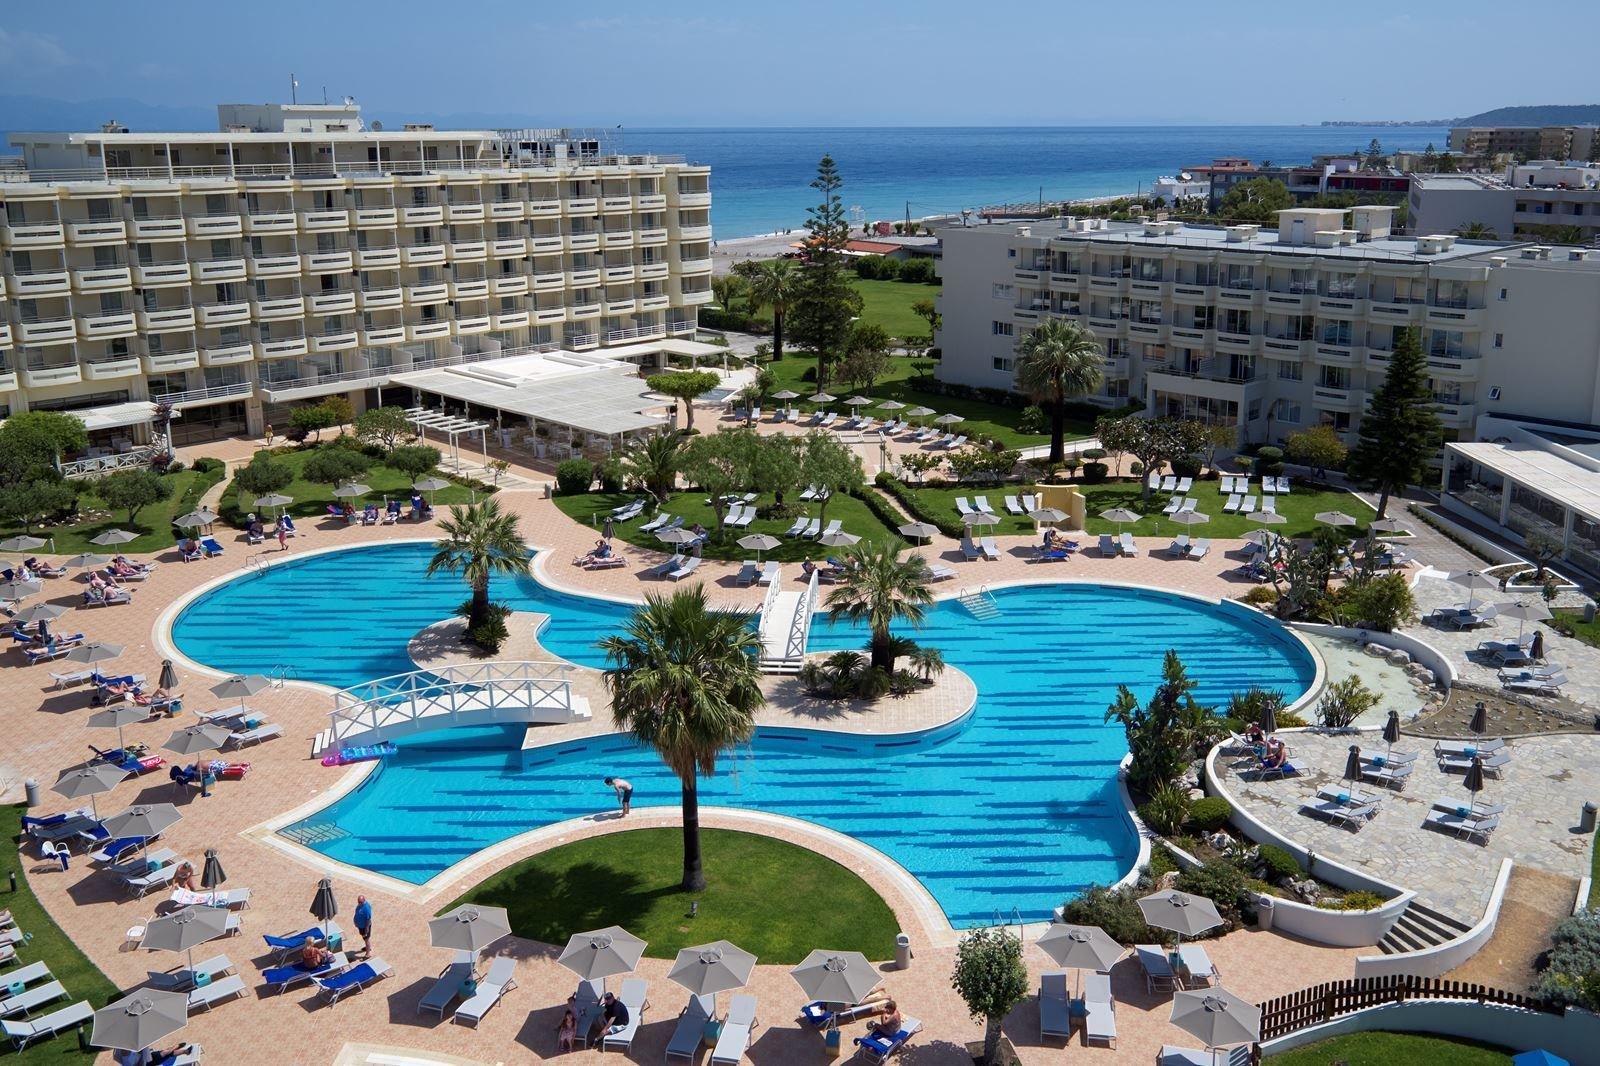 Hotel Electra Palace - Ialysos - zwembad